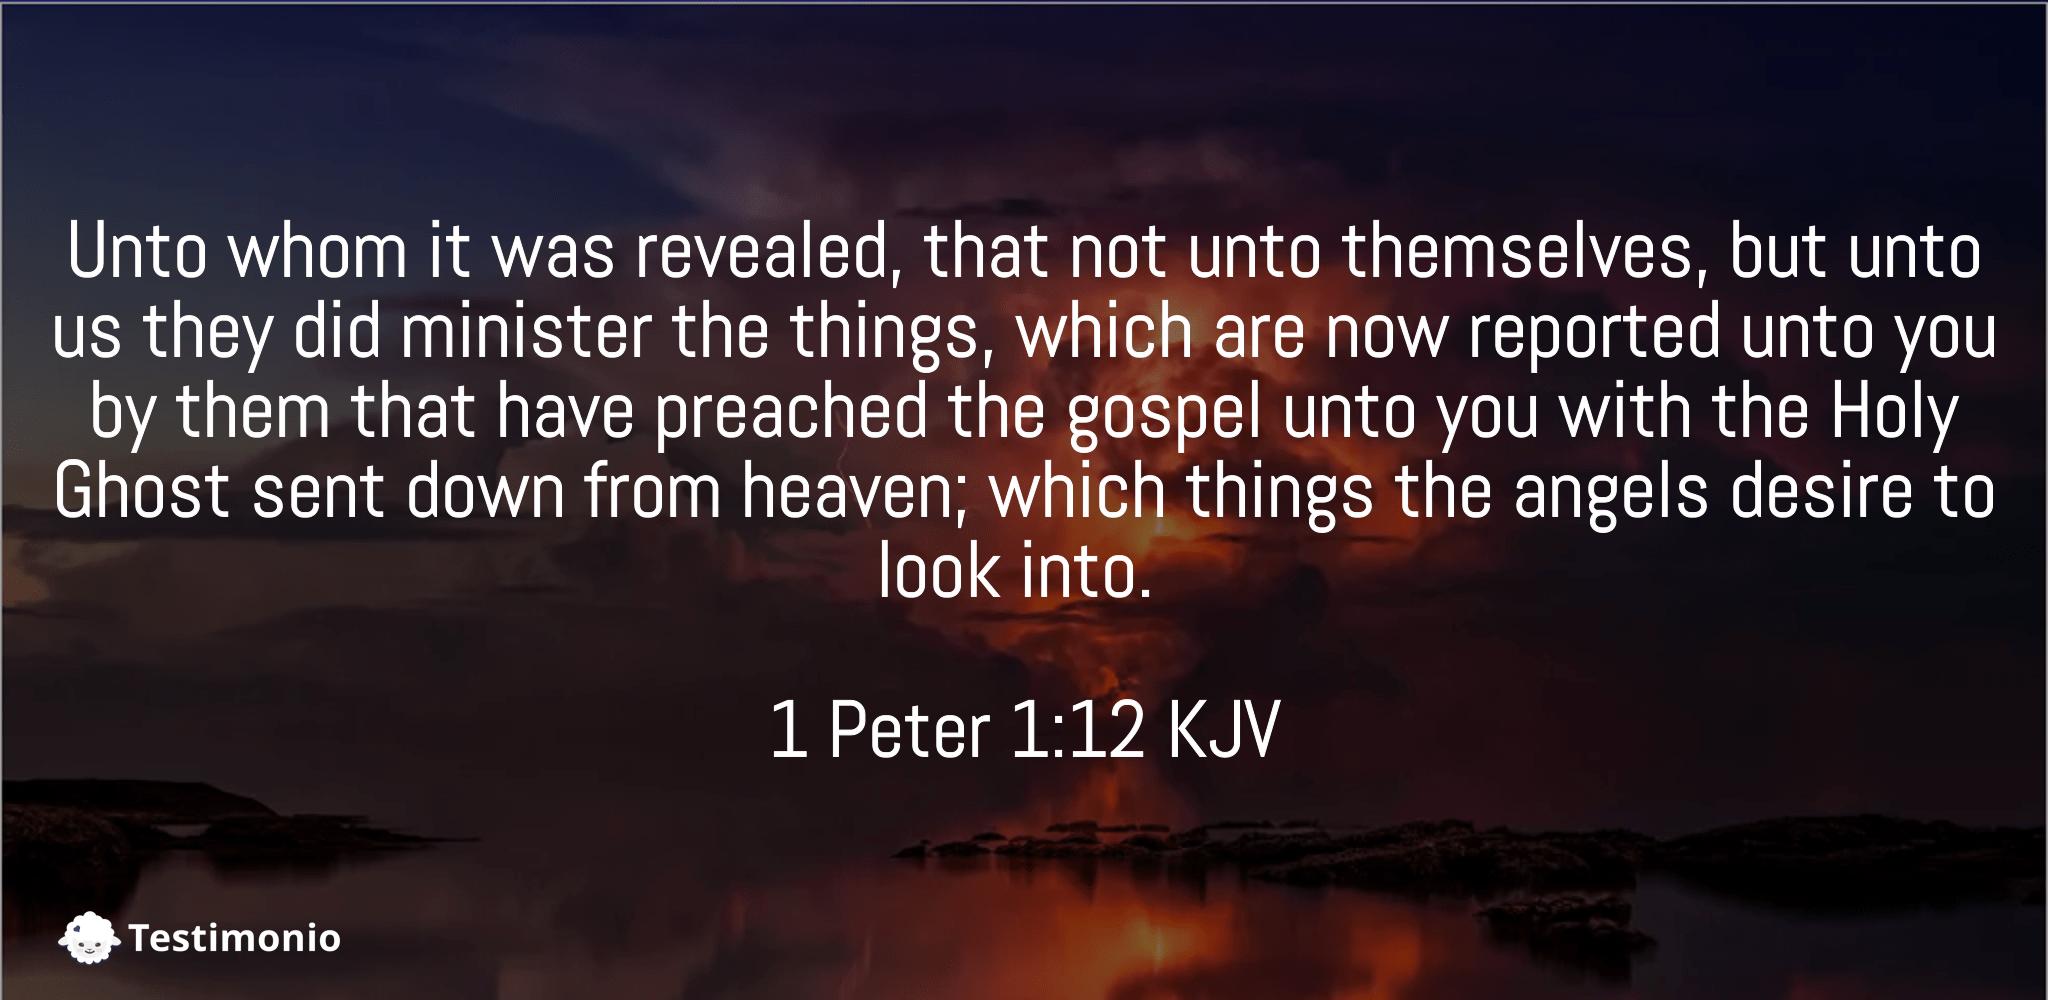 1 Peter 1:12